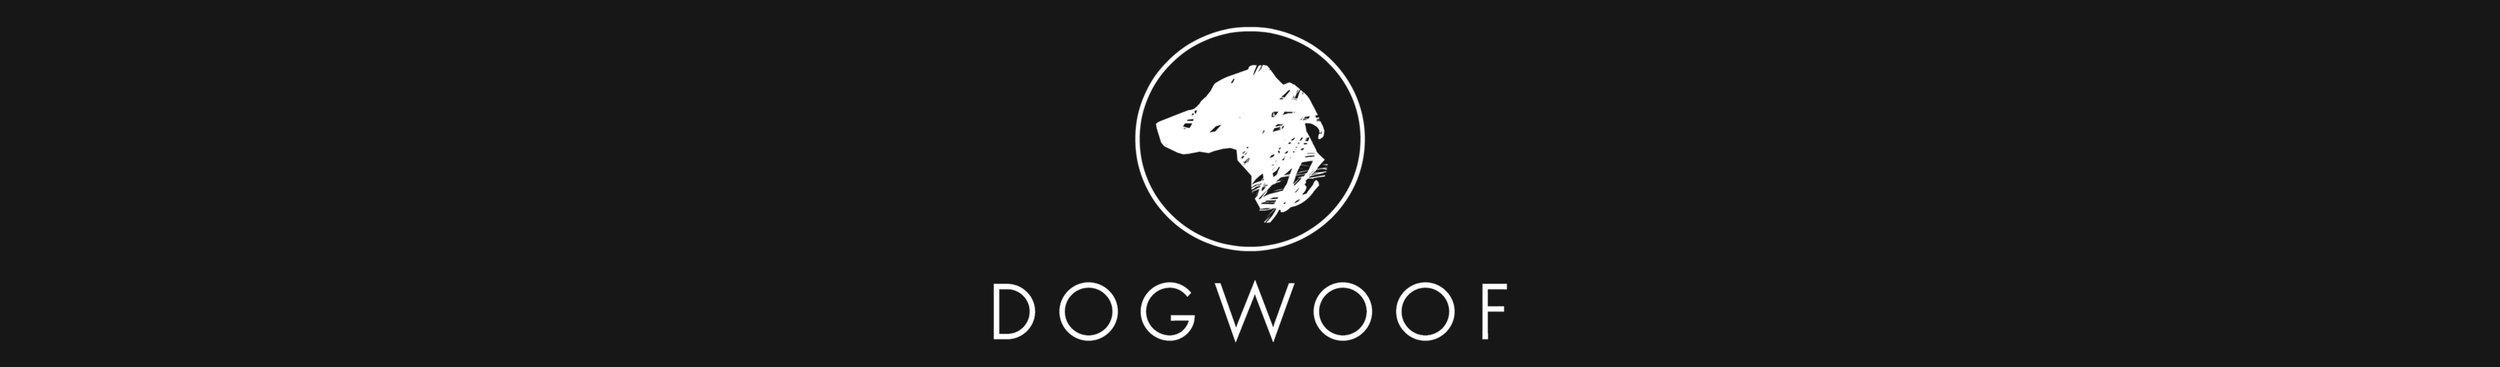 Intermission_Logo_White_Dogwoof.jpg